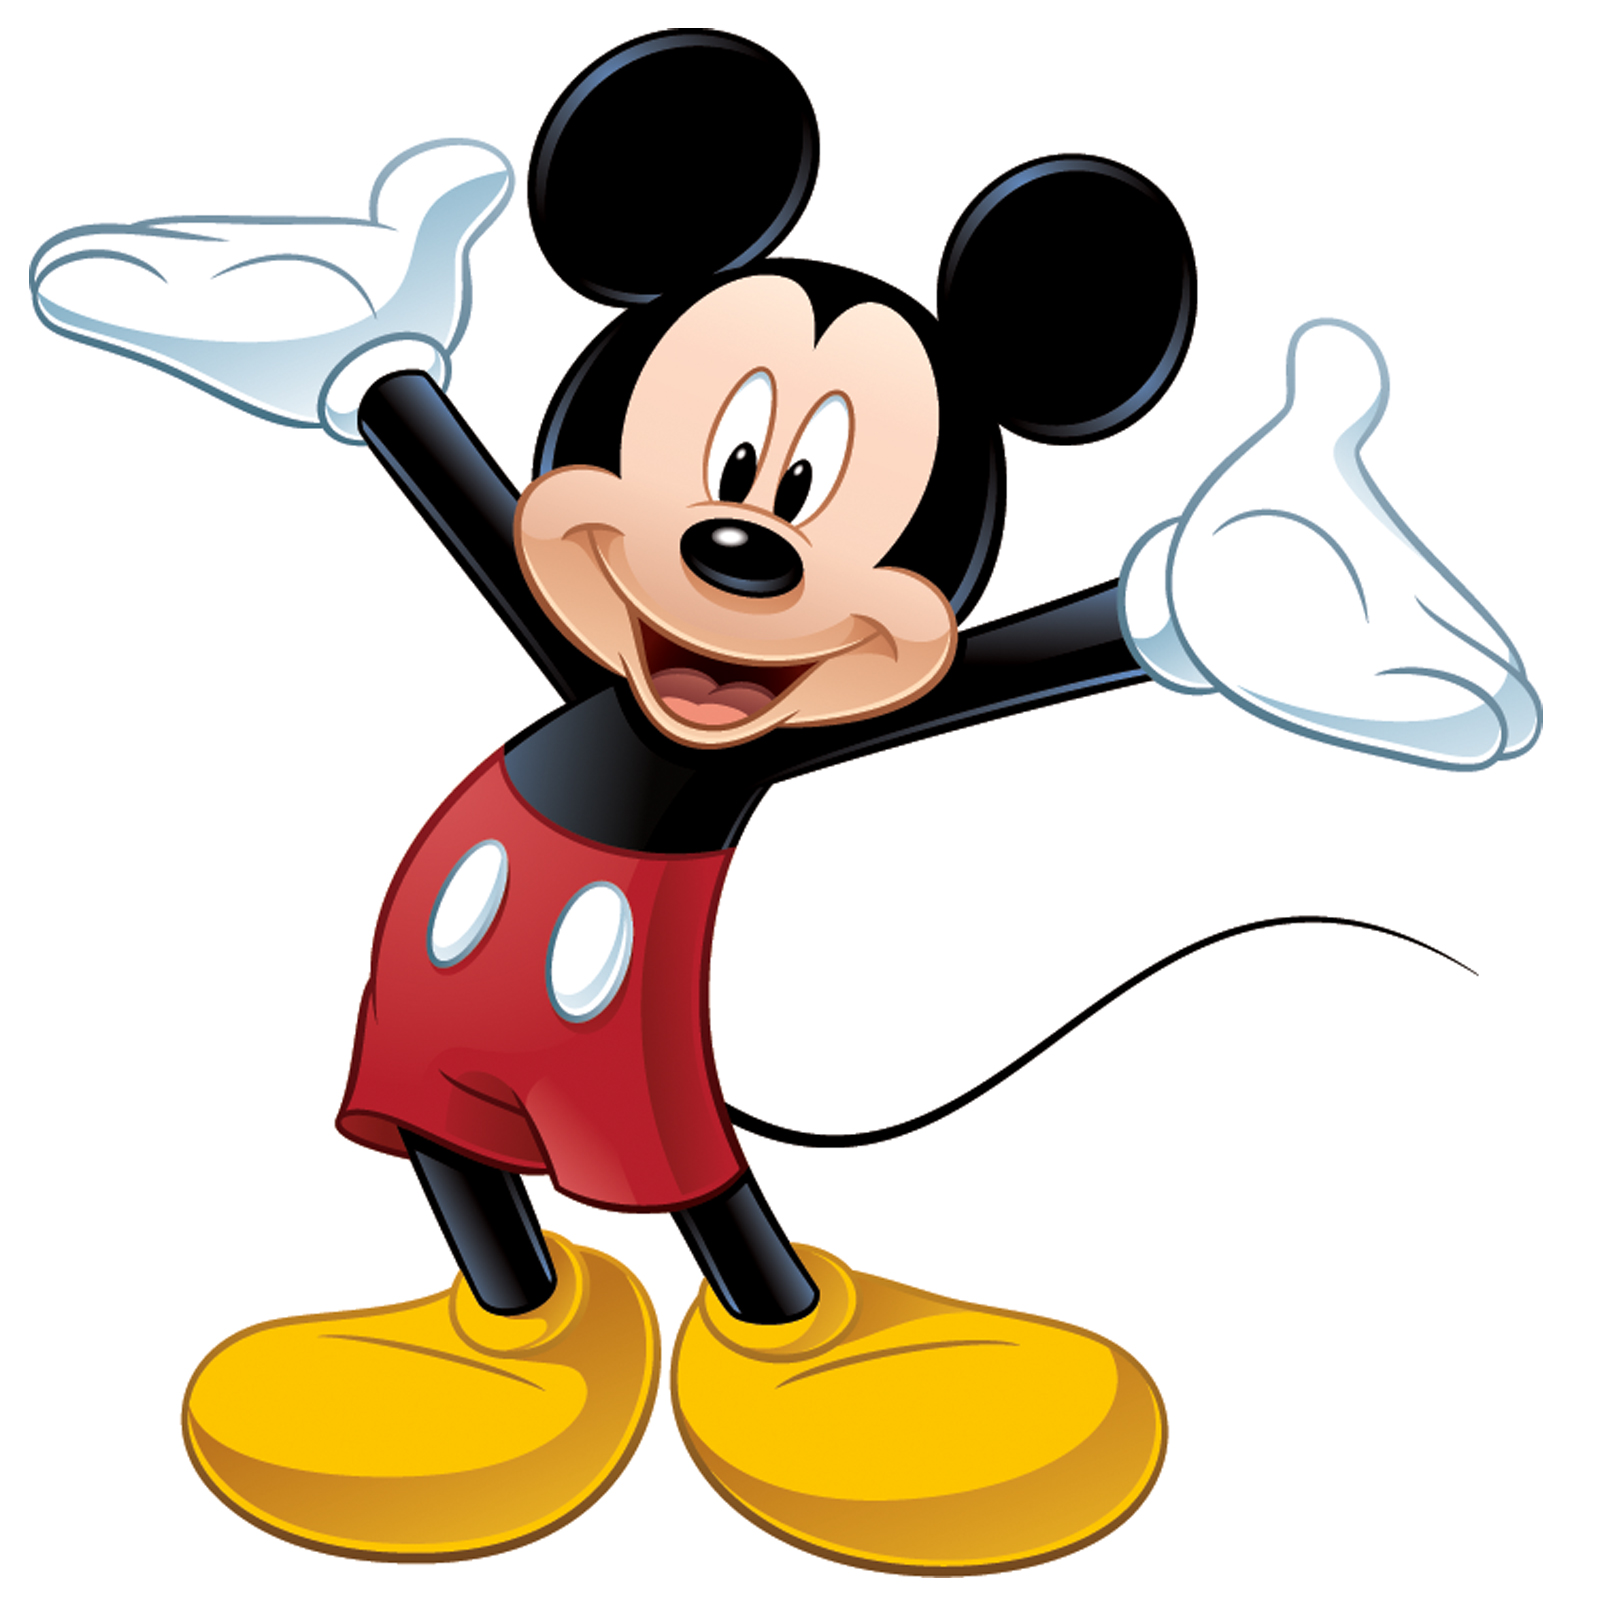 Dessin Tete De Mickey A Imprimer Gamboahinestrosa